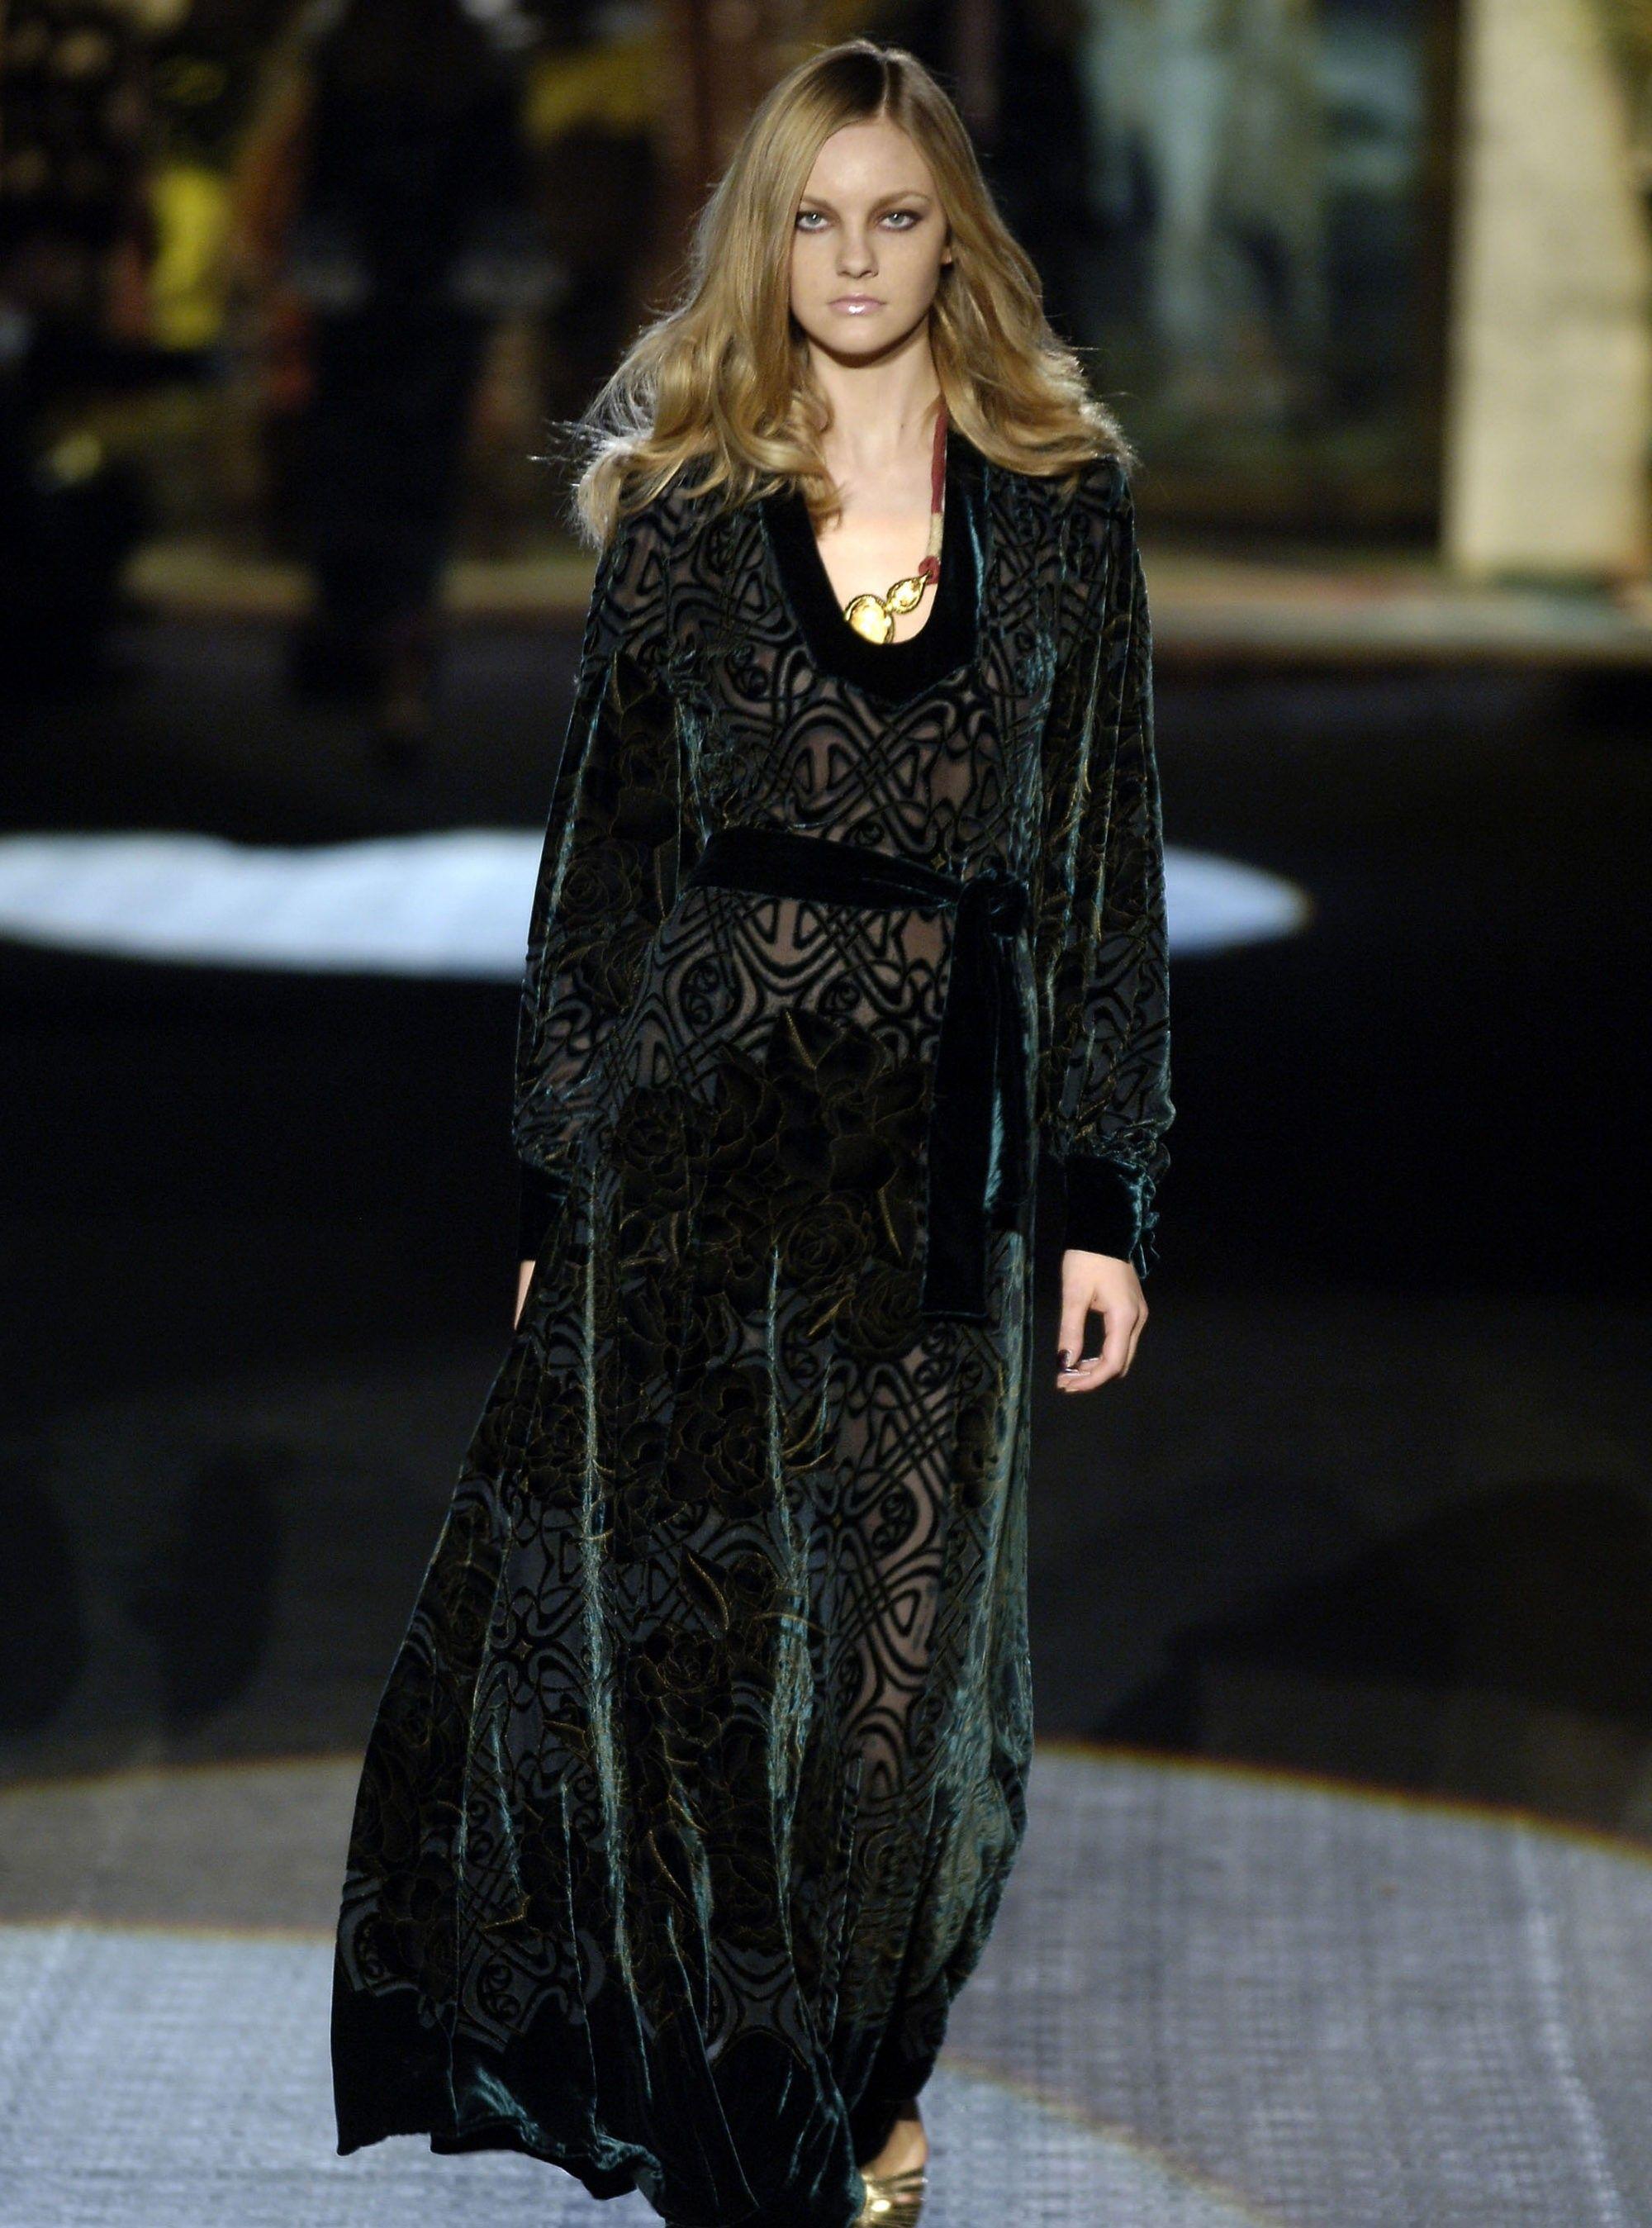 VOGUE俄罗斯:罗伯托·卡瓦利女性成衣